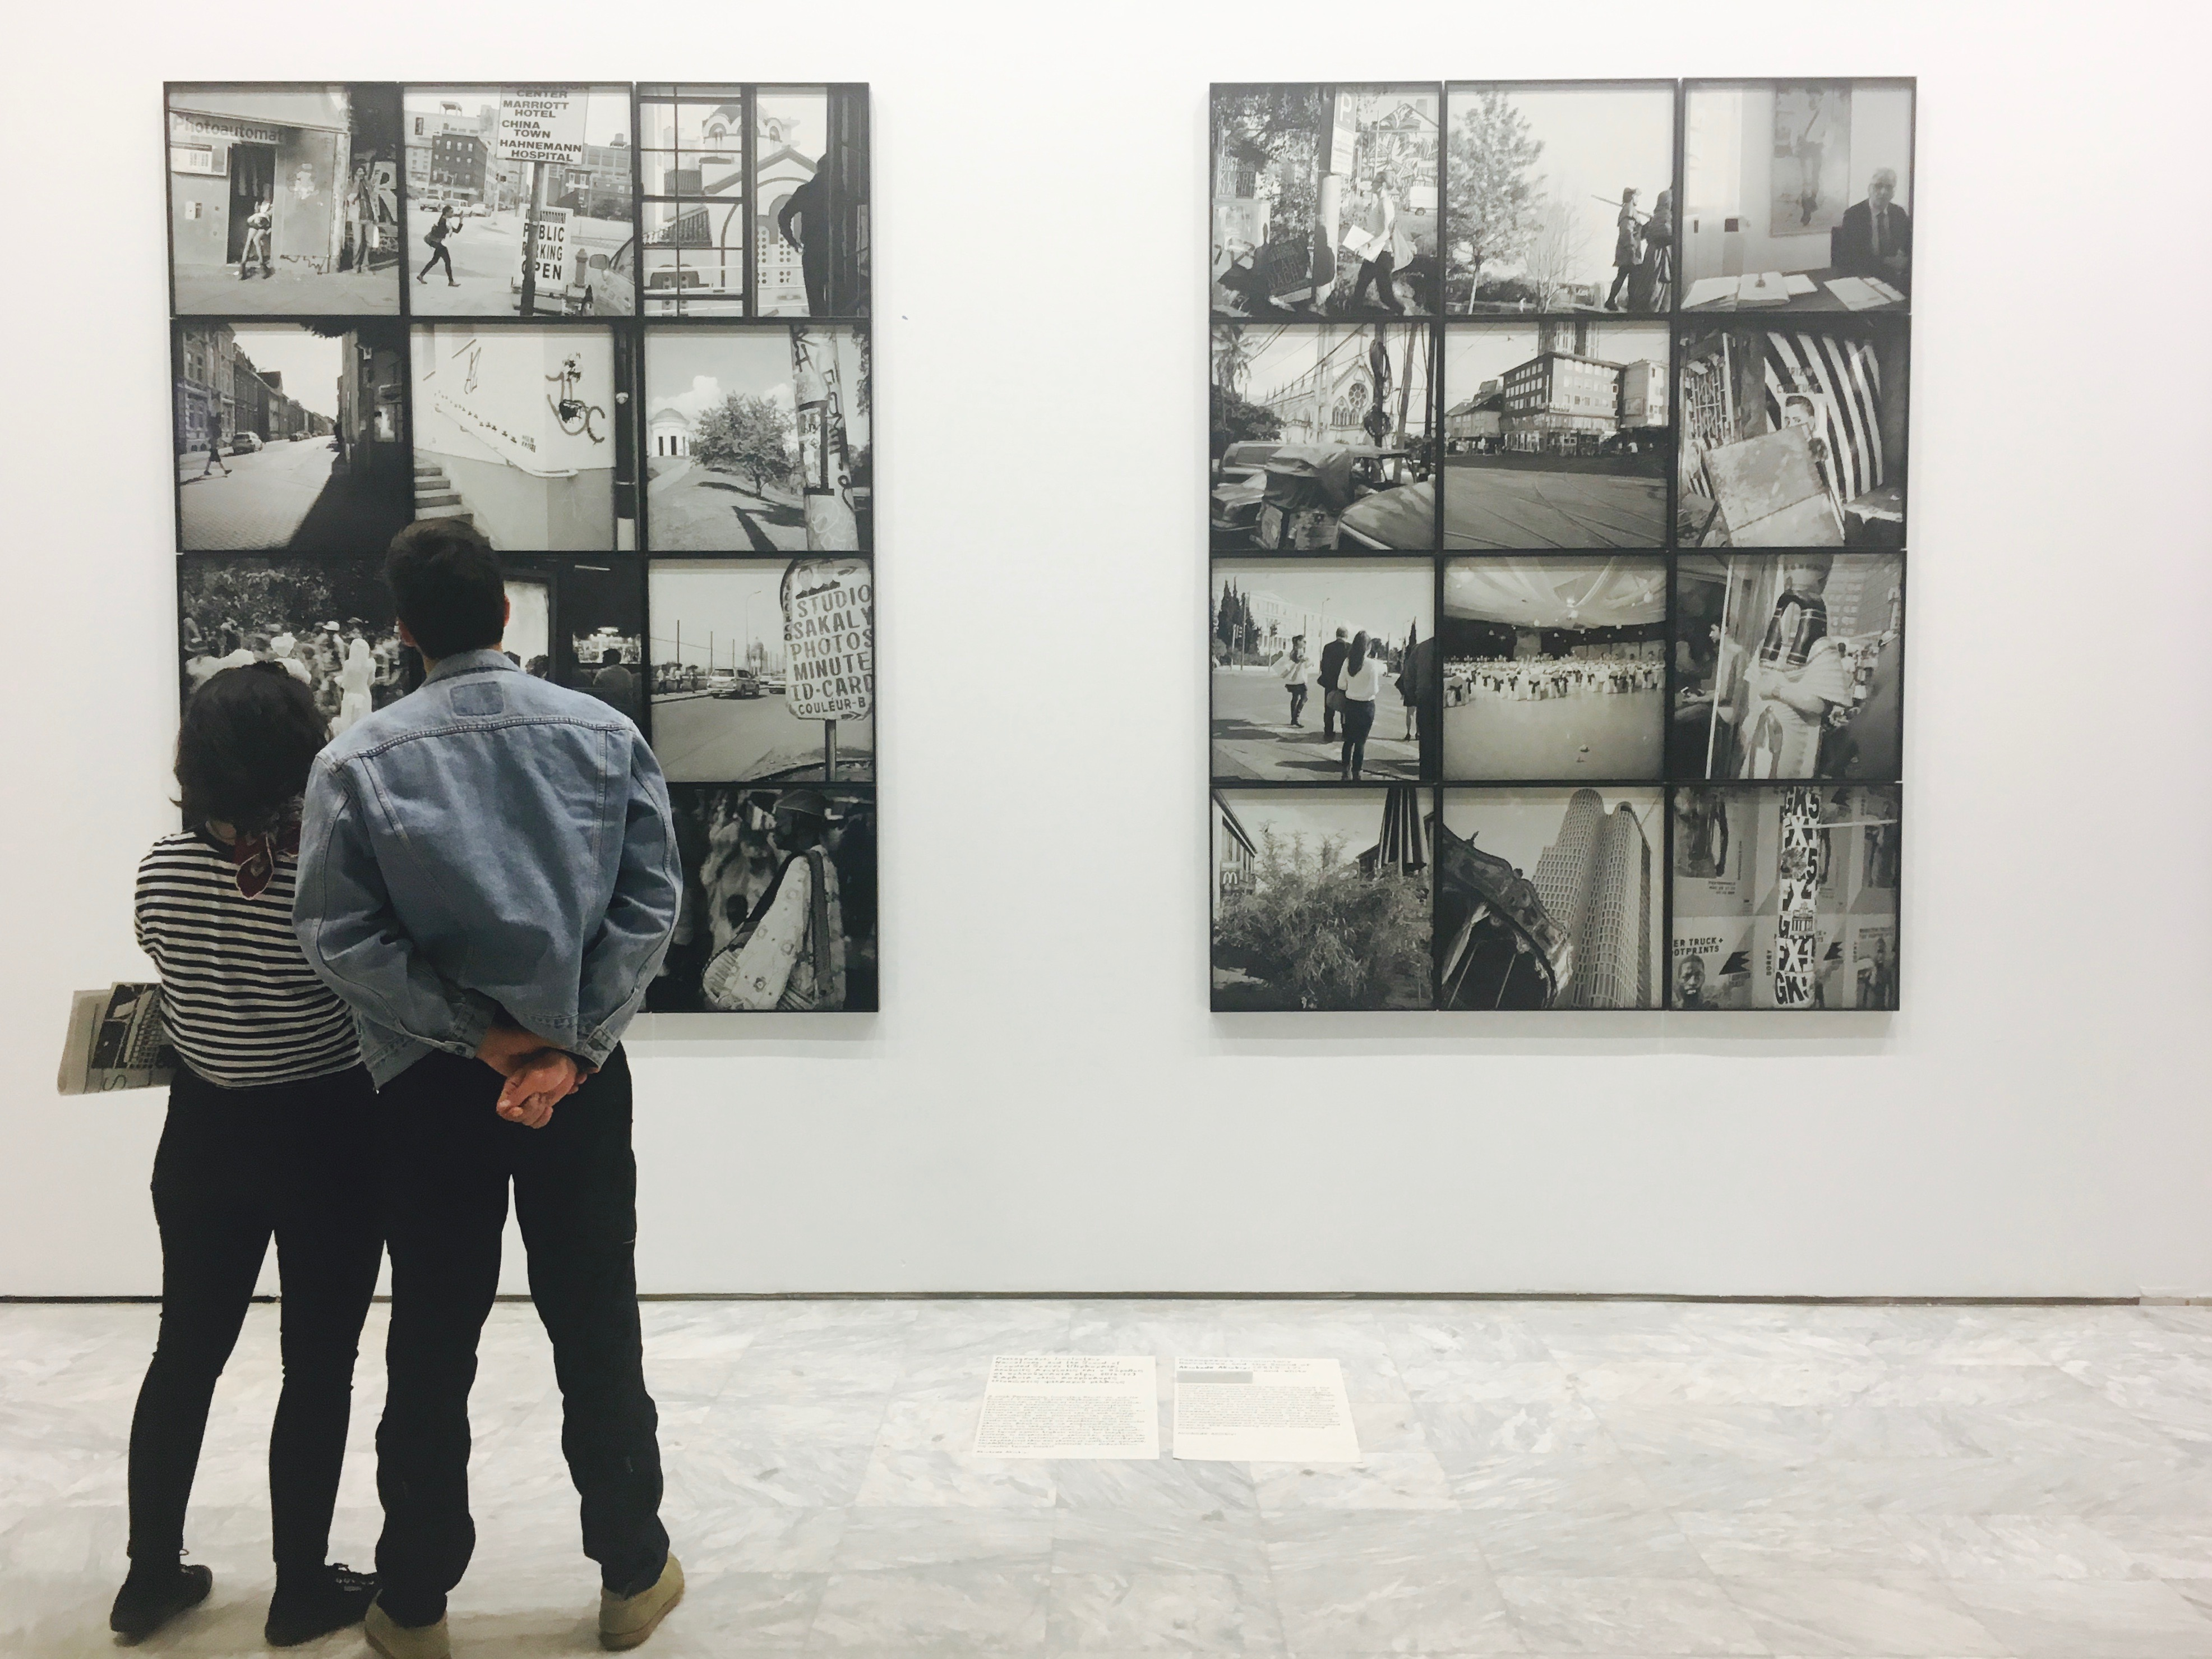 Passageways, Involuntary Narratives, and the Sound of Crowded Spaces, Akinbode Akinbiyi